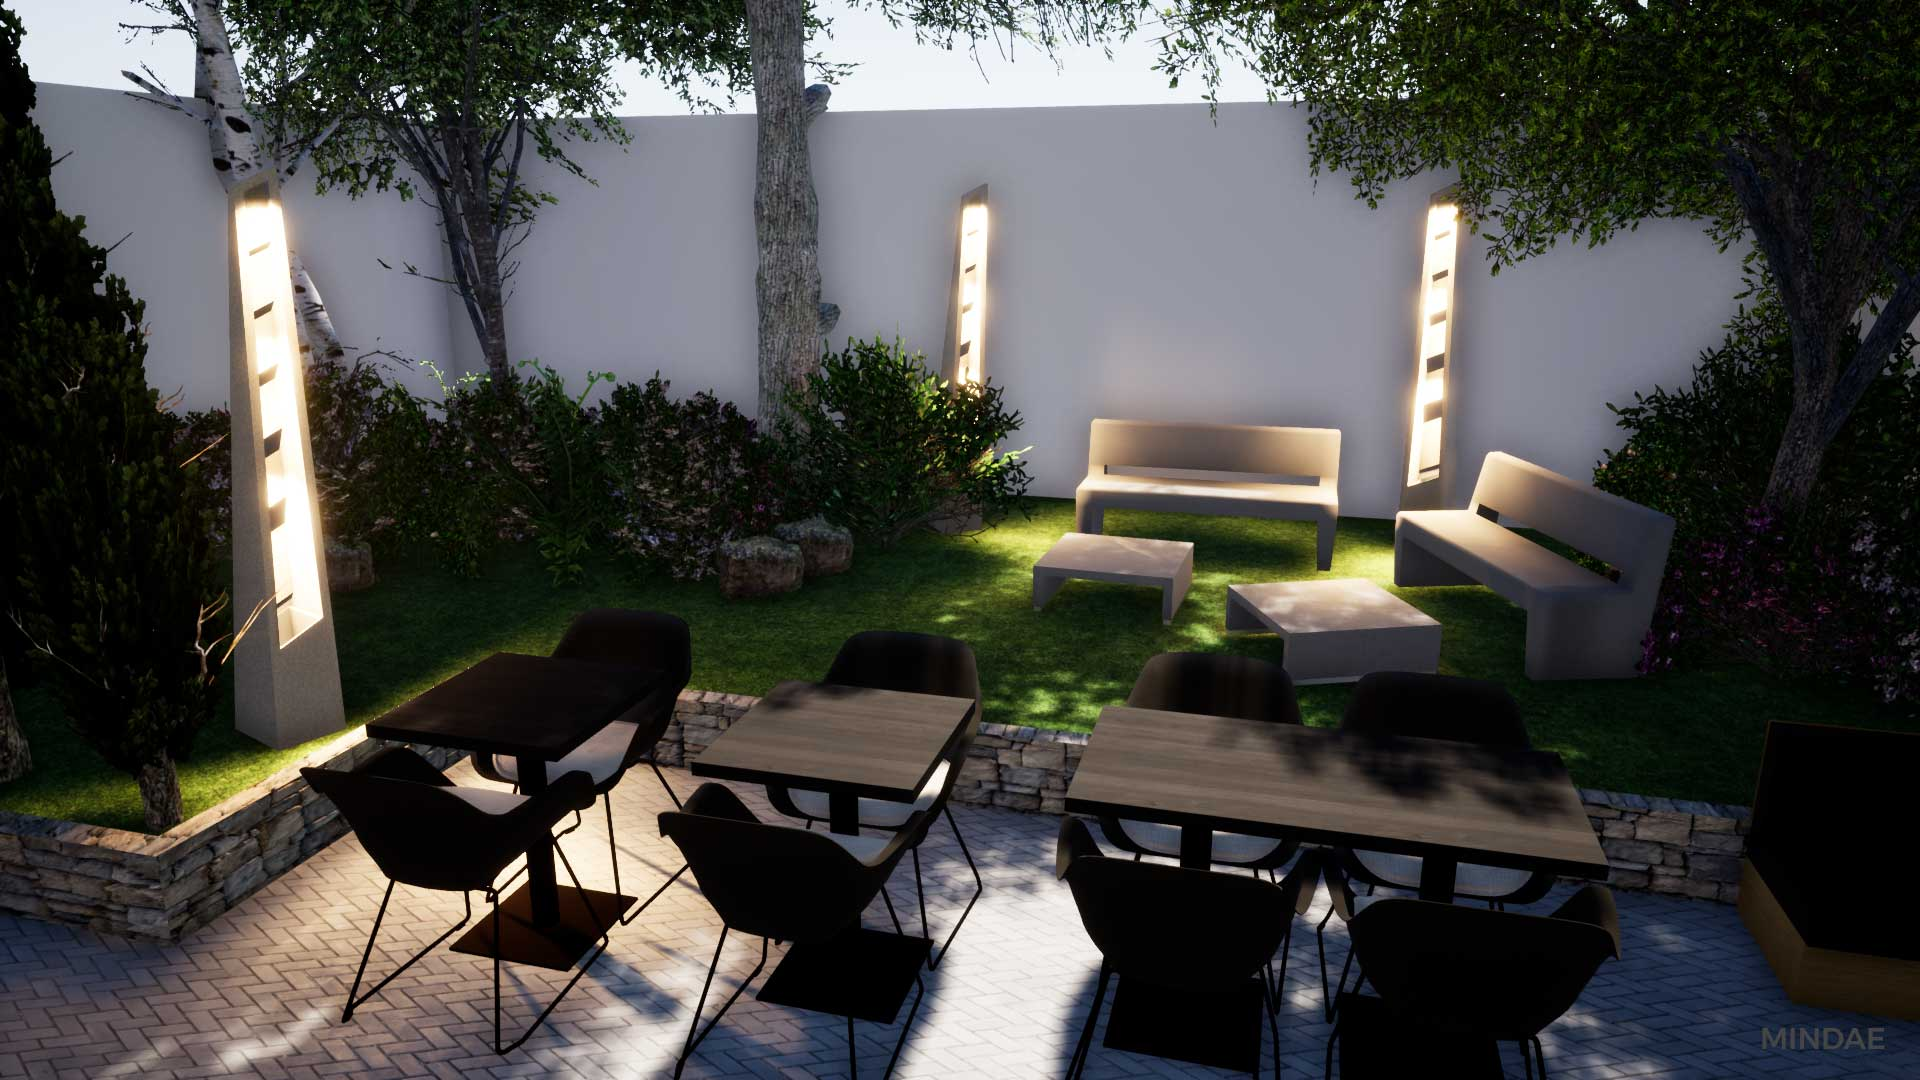 Mindae_3D_restaurant_caen_republique_agencement_bois_terrasse_comptoir-(5)